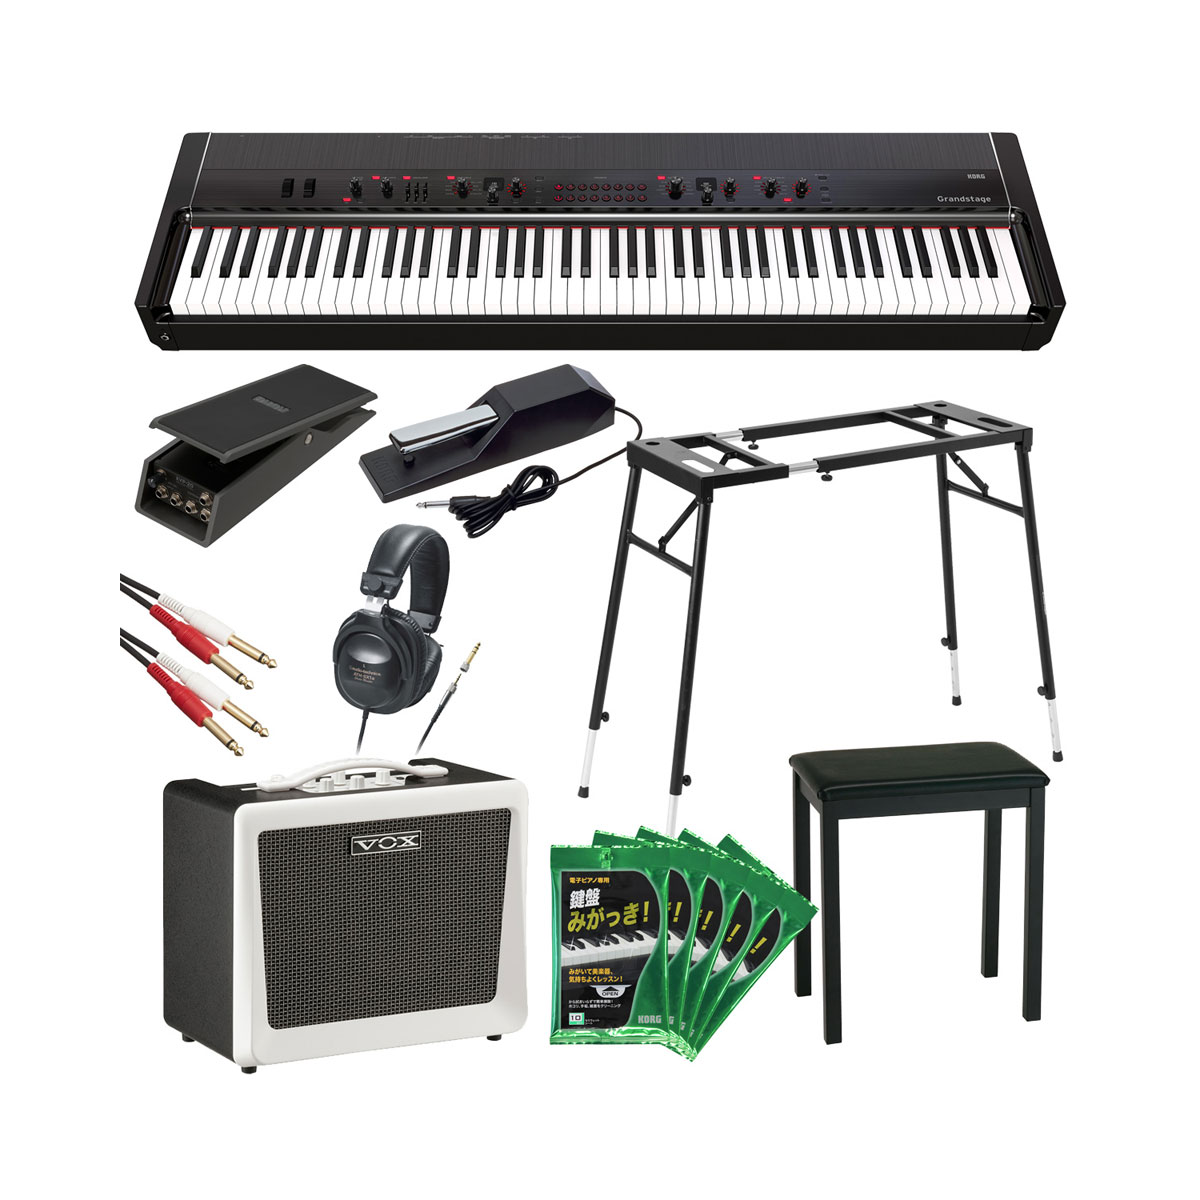 KORG コルグ / Grandstage (GS1-88) 【超豪華オプションセット】 88鍵 ステージ・ピアノ【YRK】